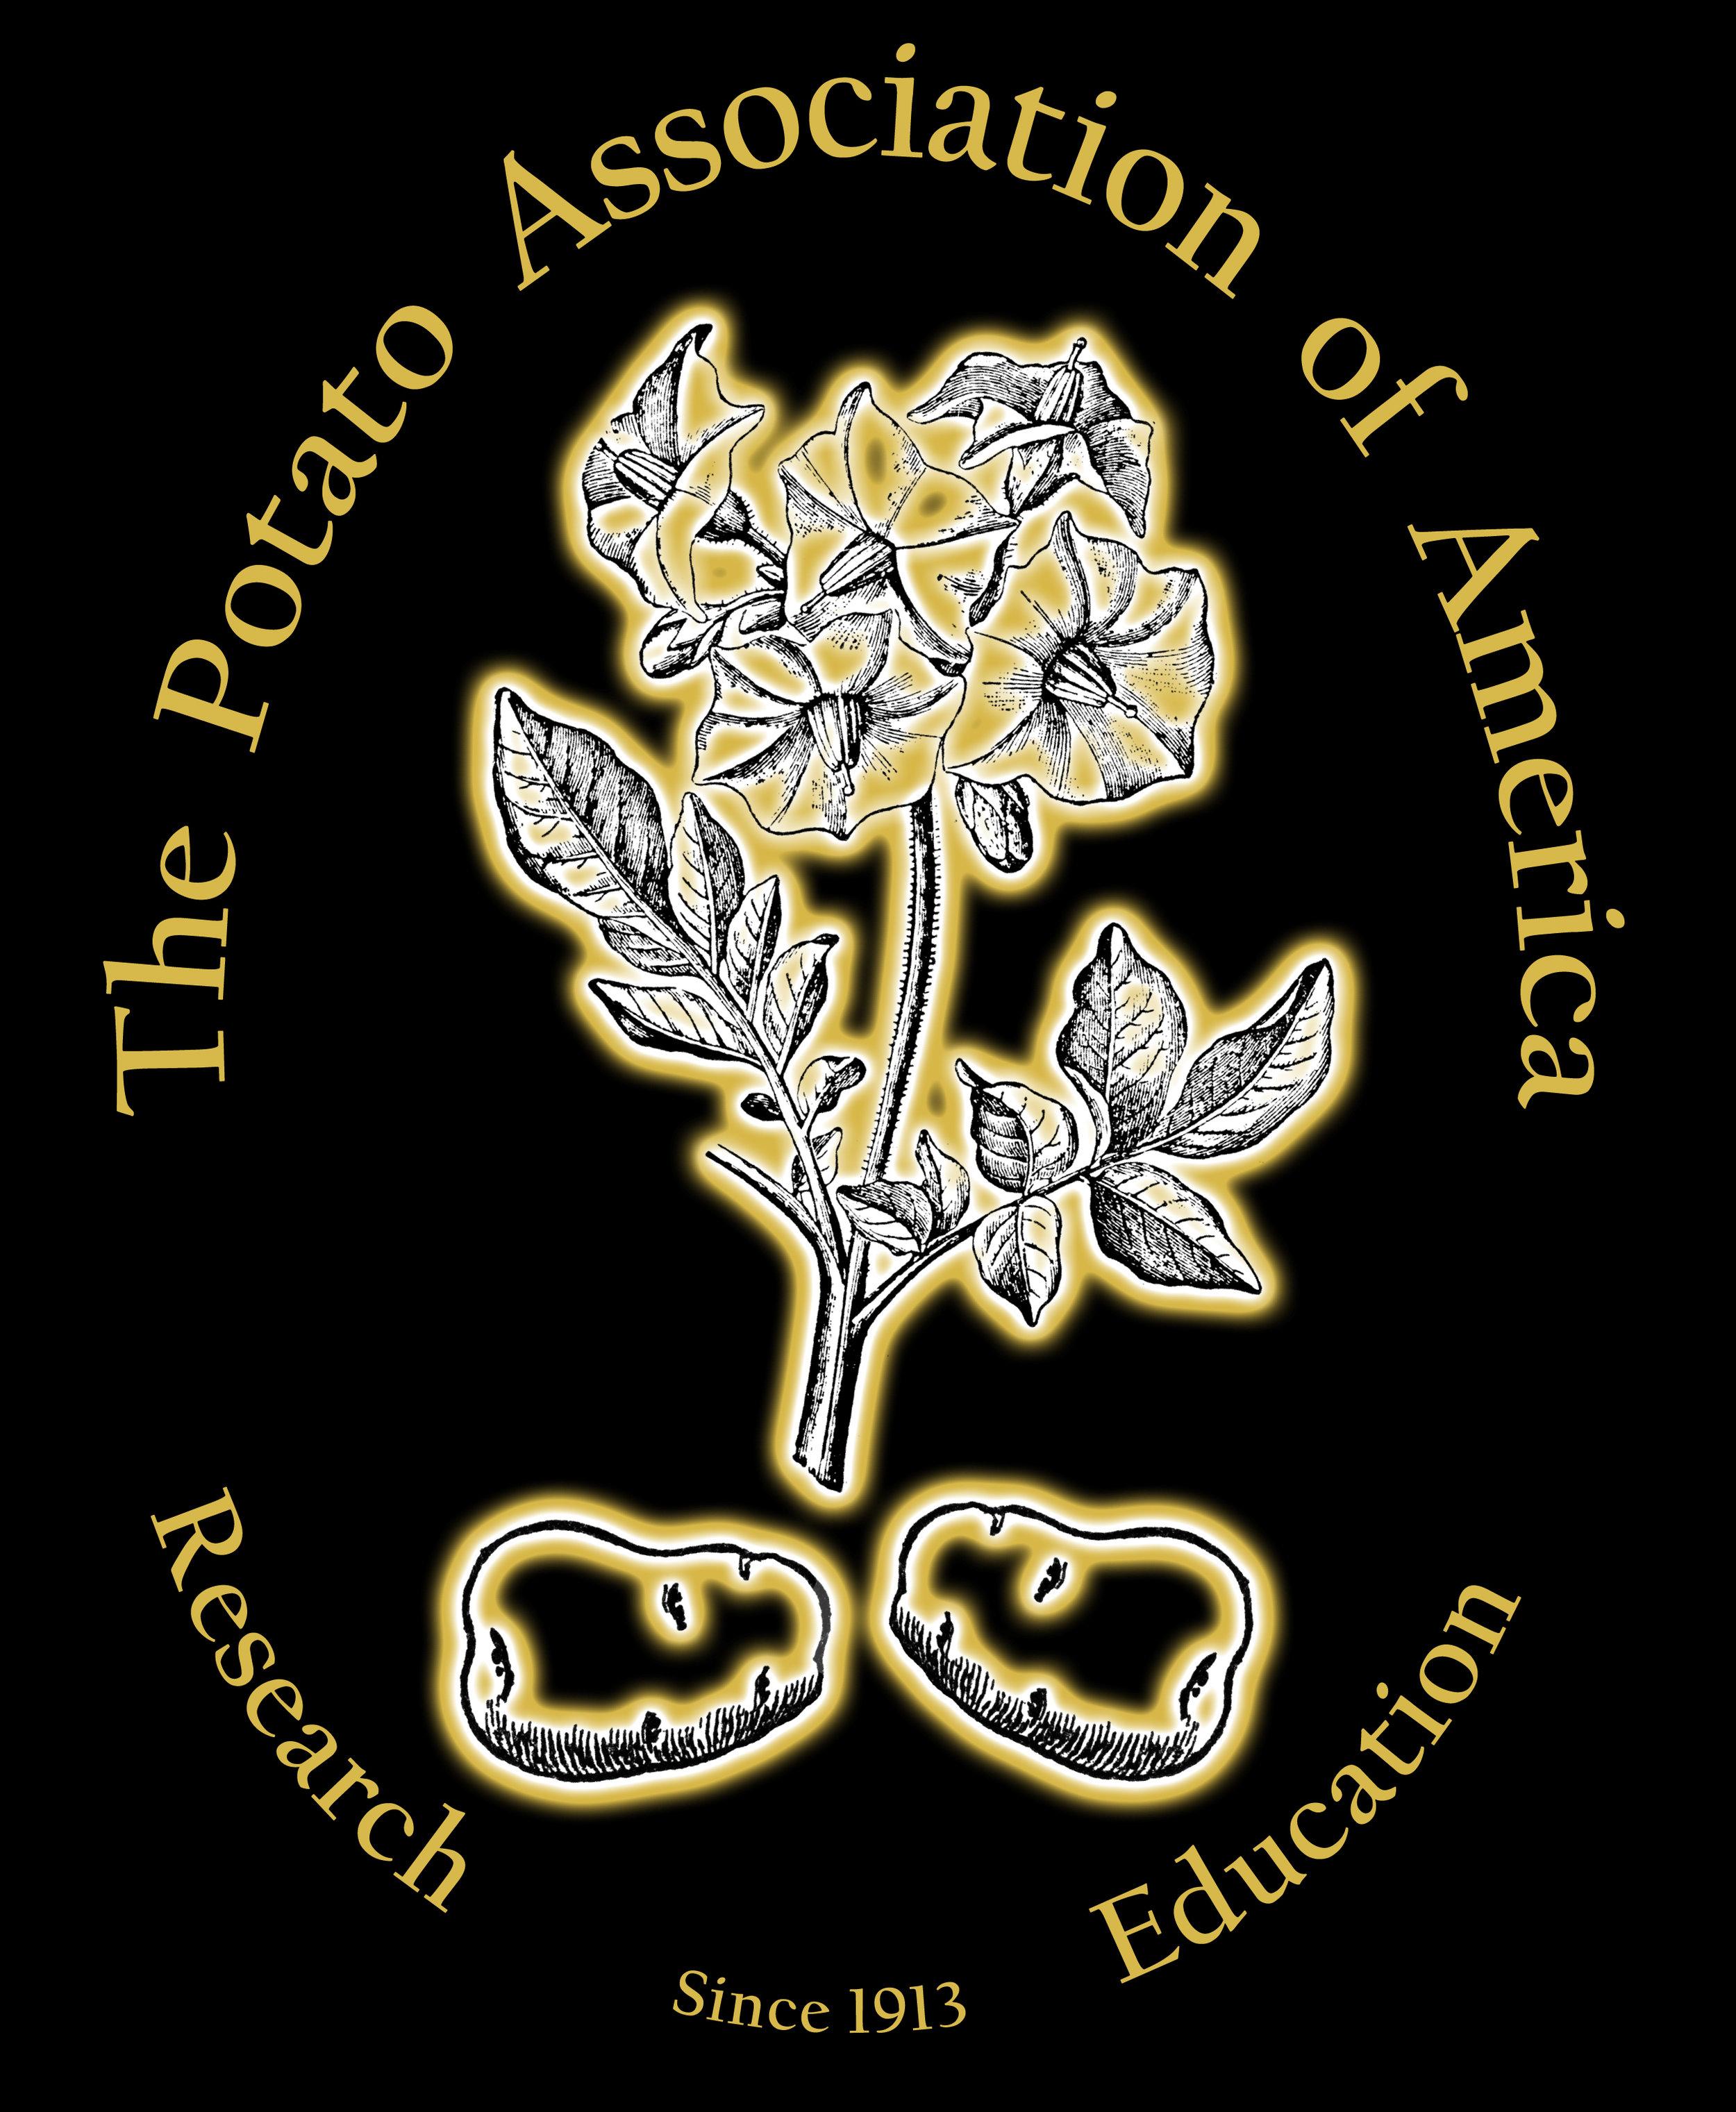 Scientific society logo